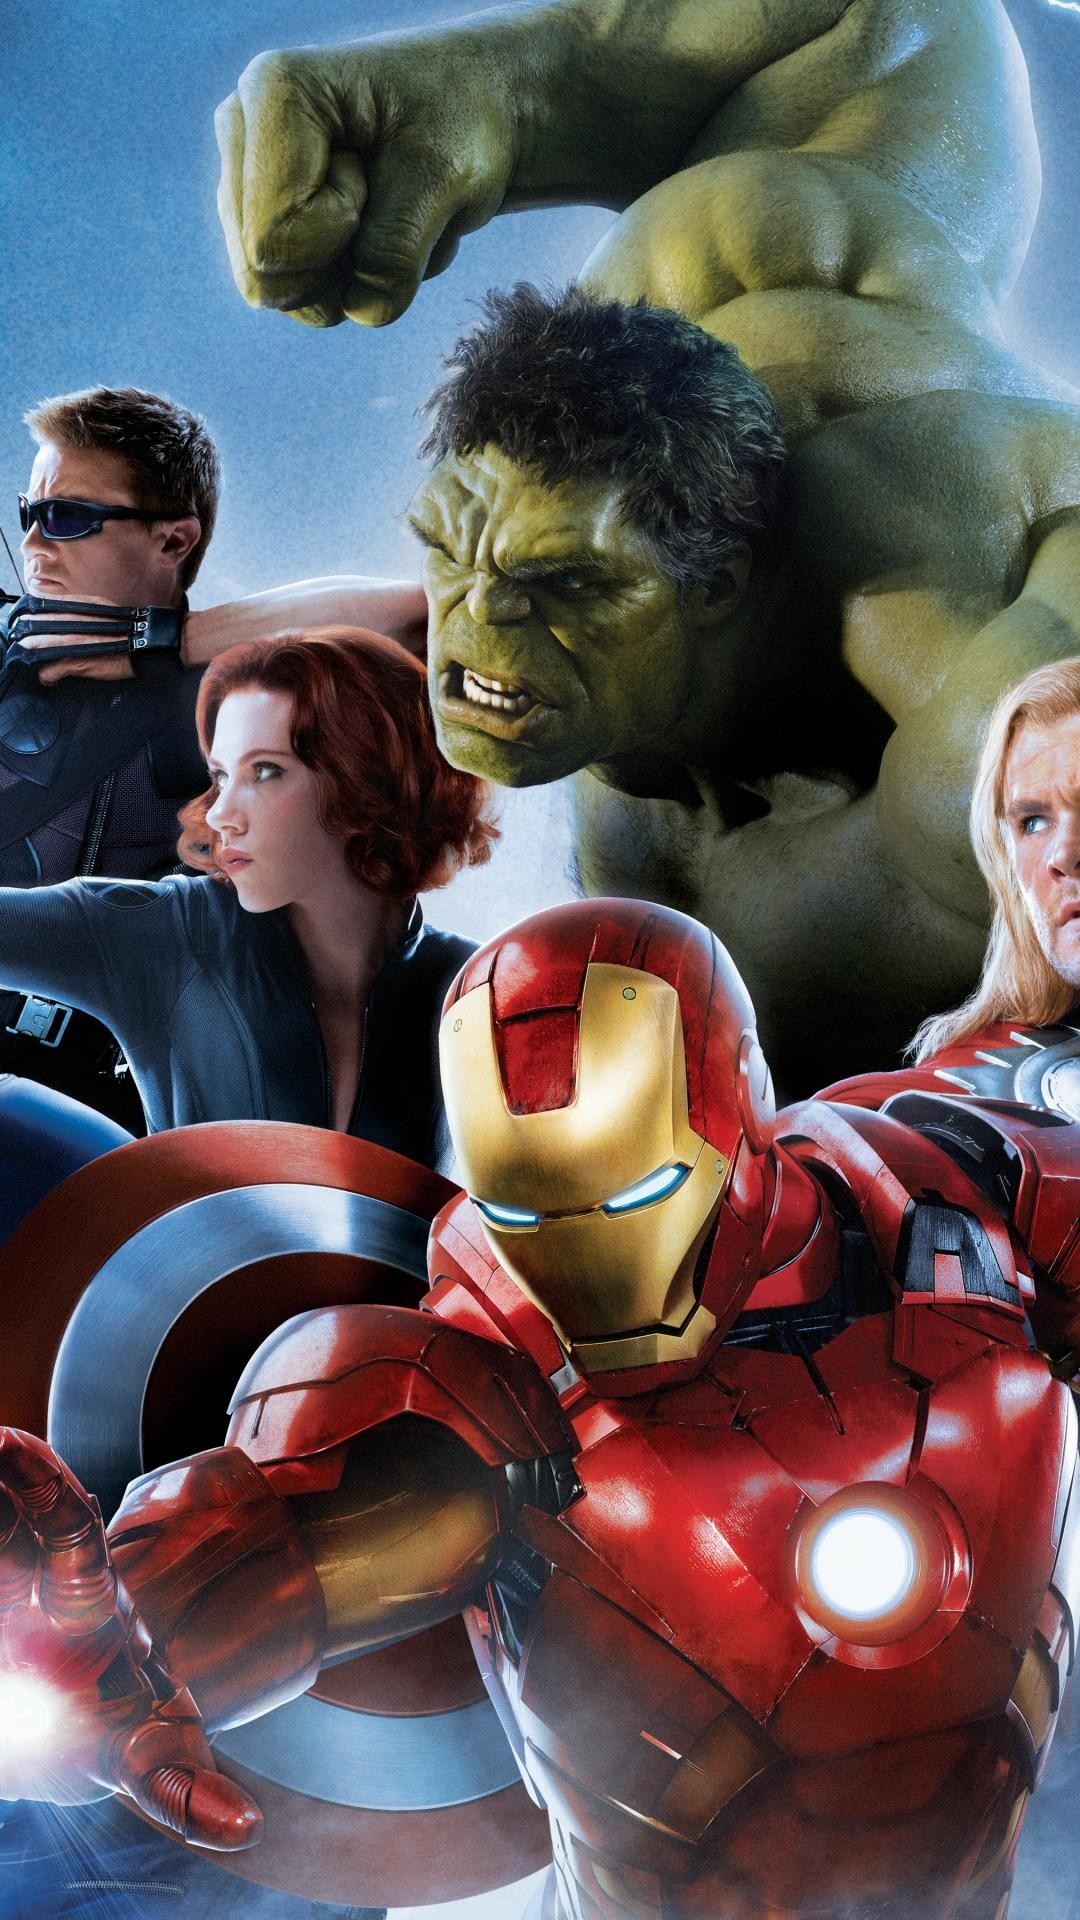 wallpaper.wiki-Avengers-Iphone-Wallpaper-for-Desktop-PIC-